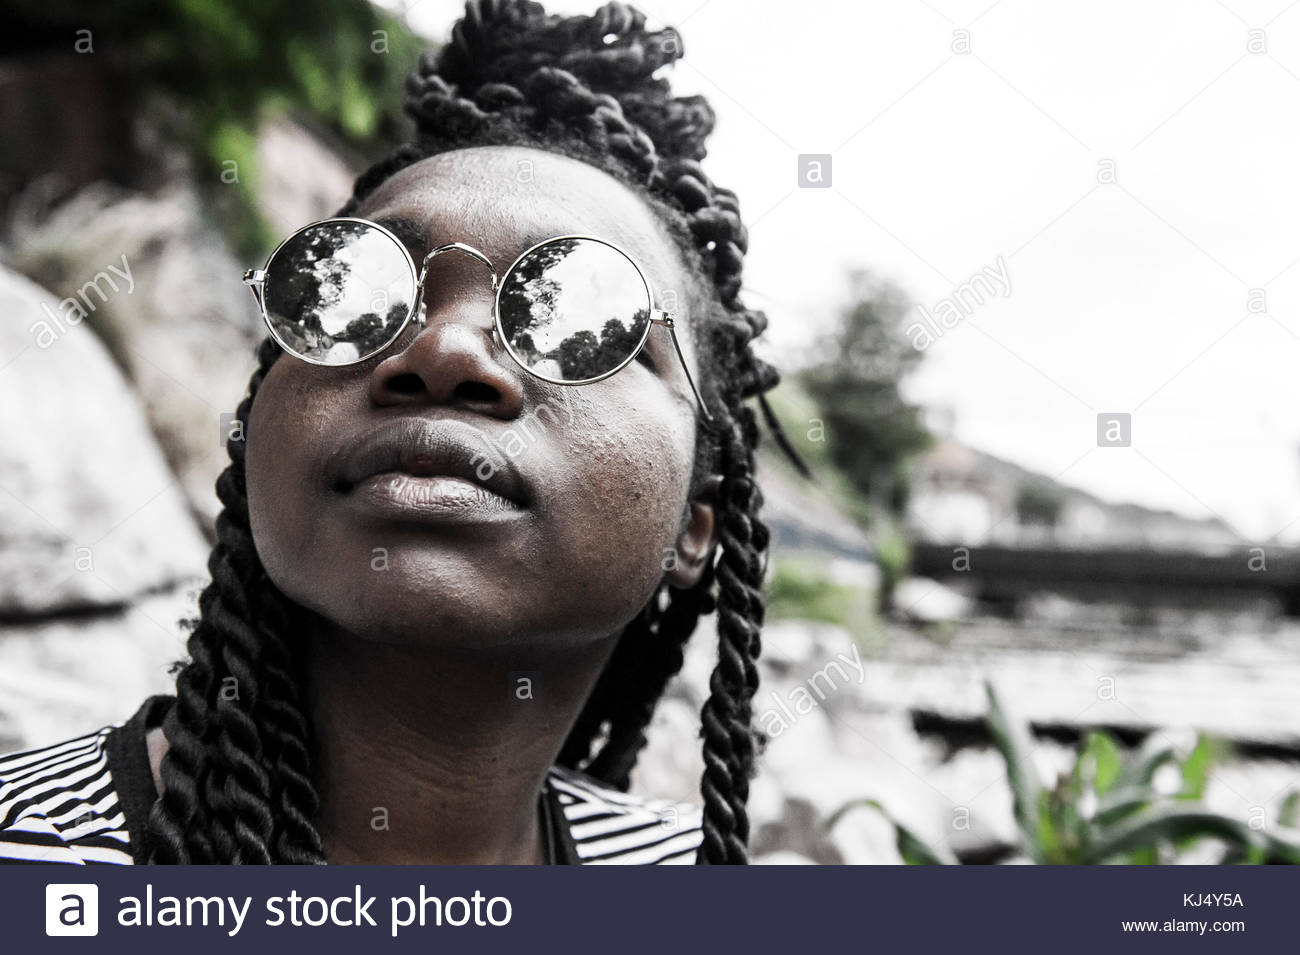 Junge elegante schwarze Frau mit Sonnenbrille close-up Stockbild